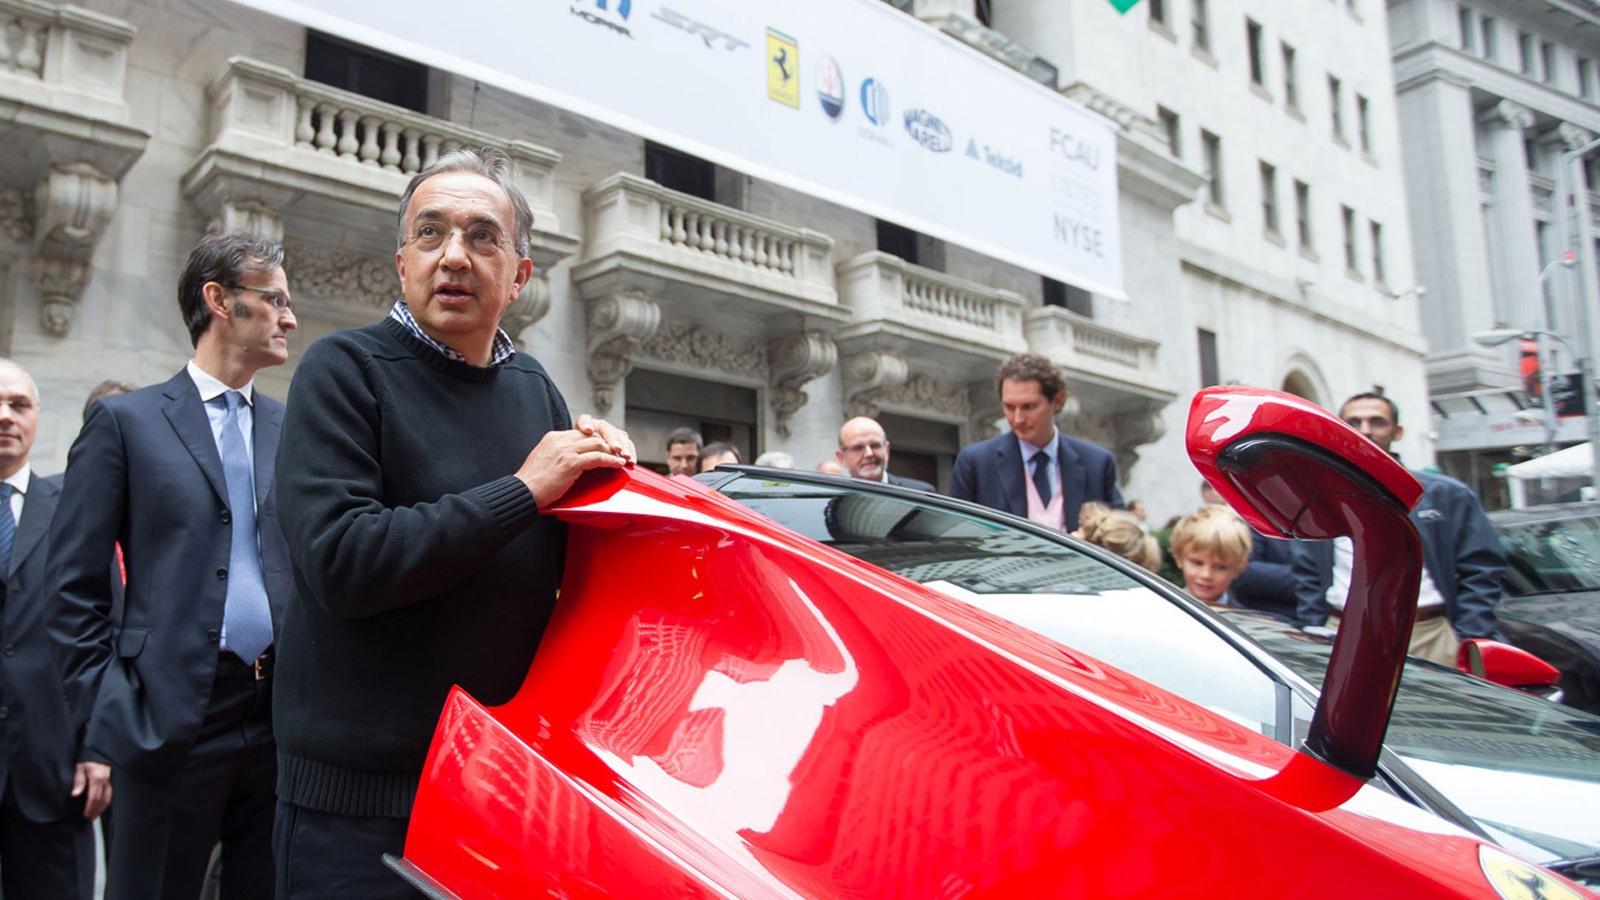 ���ֿ�3����app��18Ԫ�ʽ�,日产汽车前CEO:我为公司做了很多,没什么可羞愧的